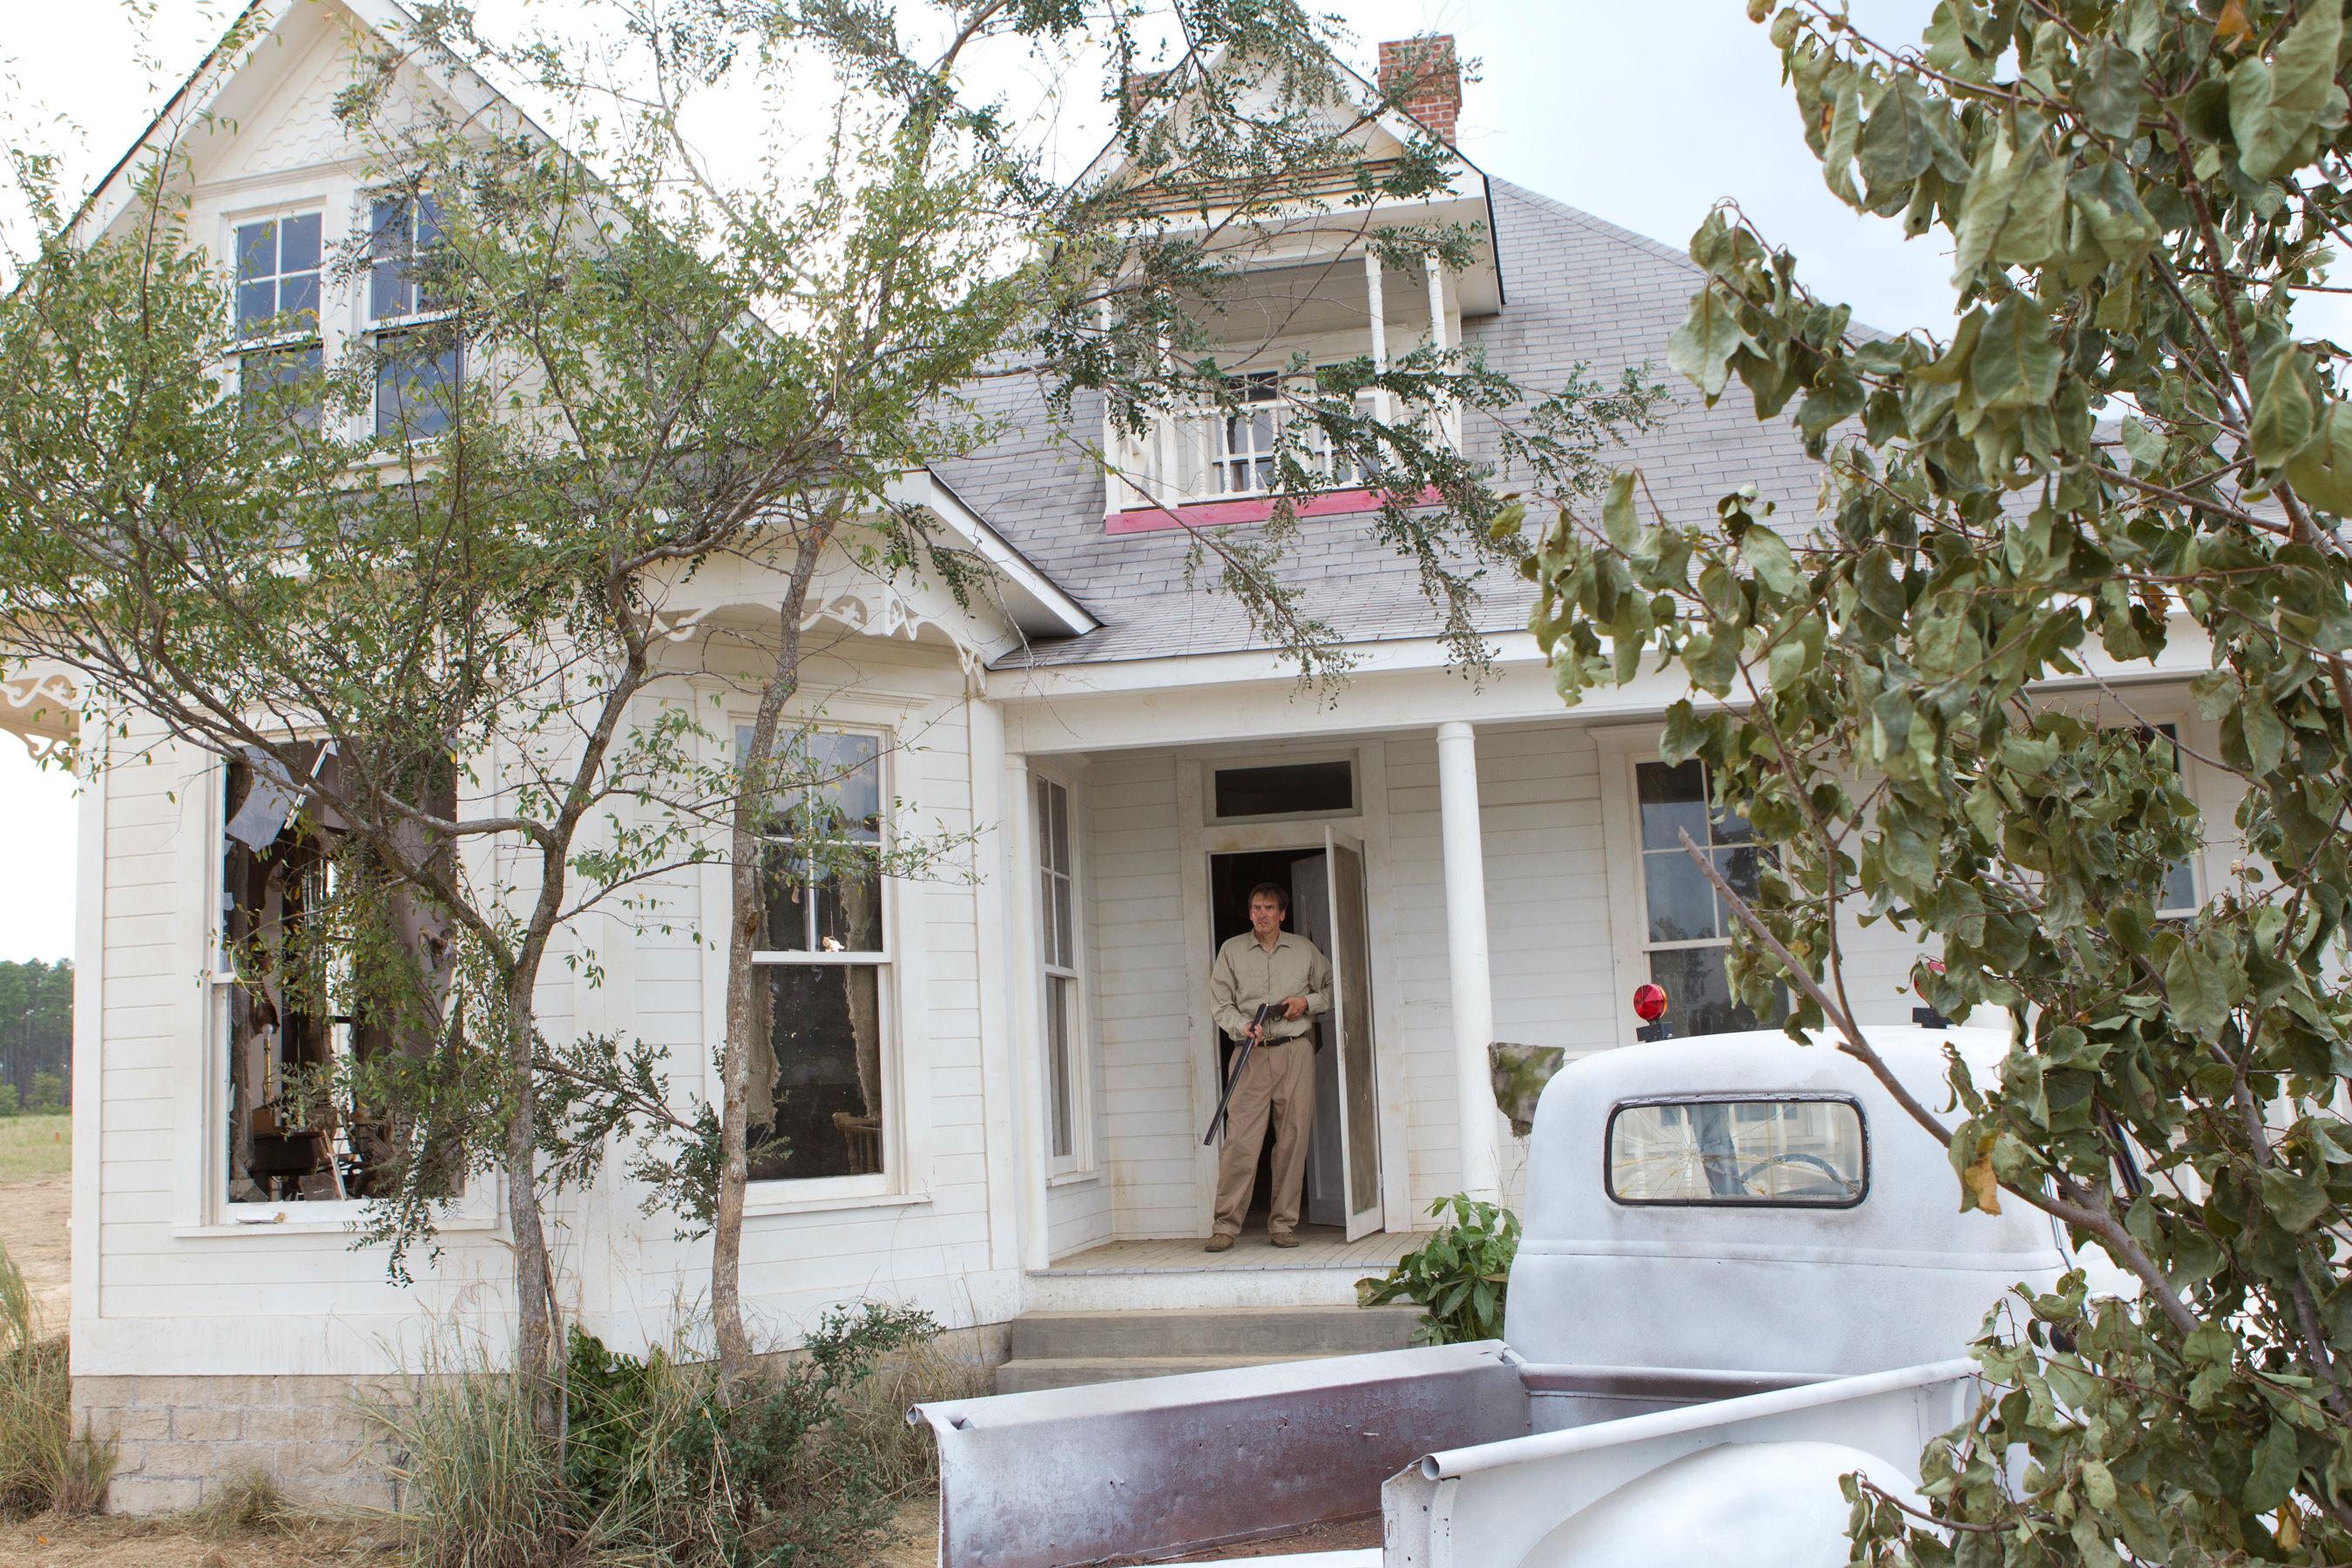 U0027Texas Chainsaw 3Du0027 Set Visit: A House Of Horrors Rebuilt, A Franchise  Revered U2013 /Film